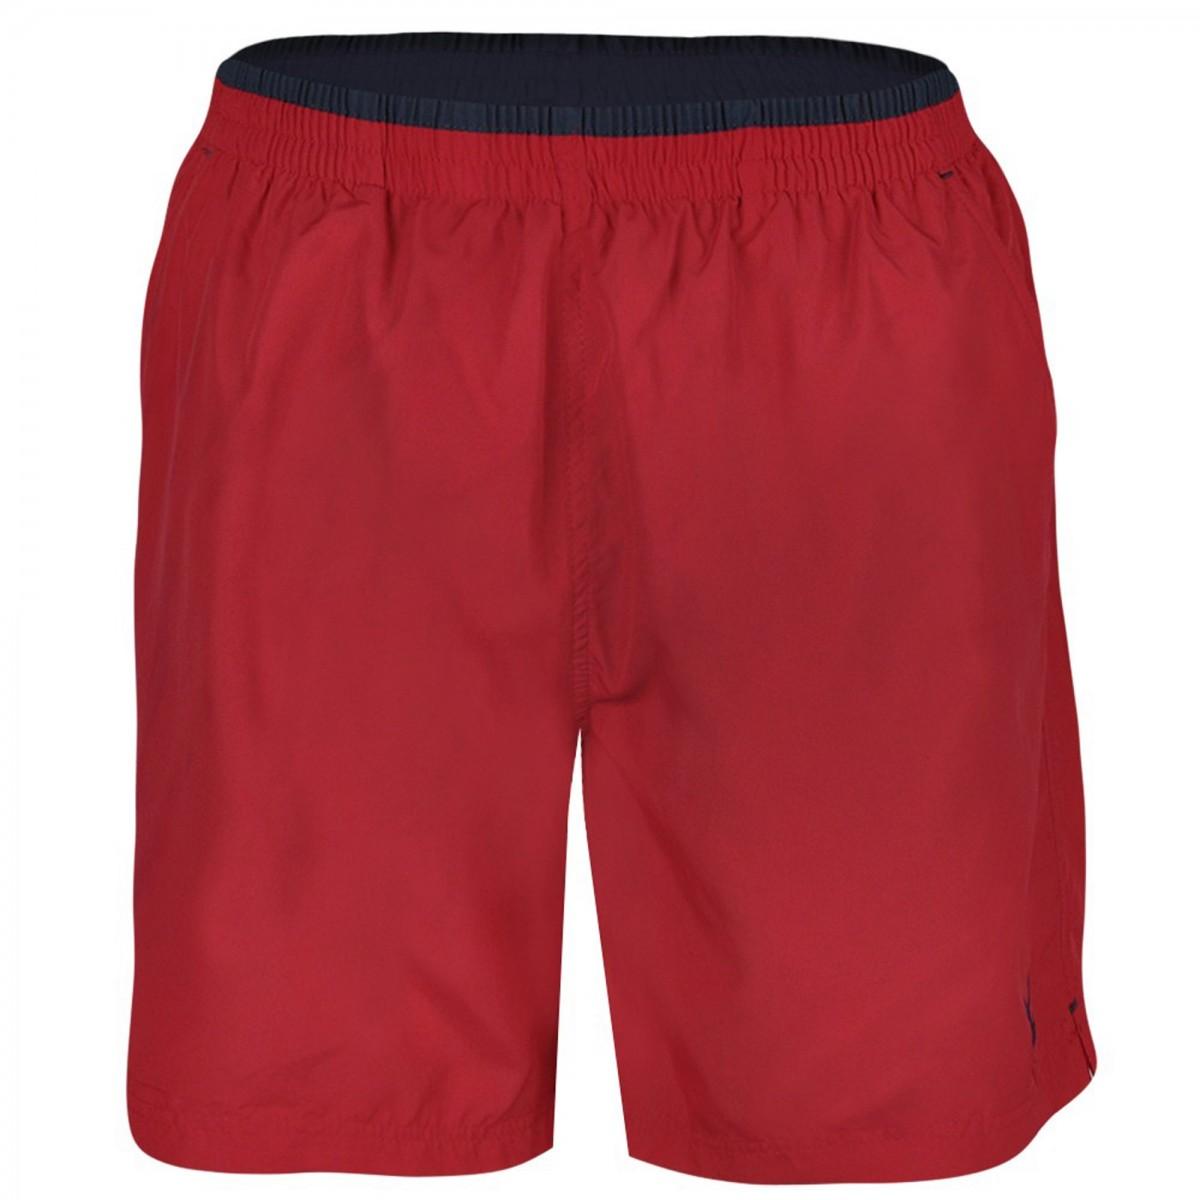 Bermuda Mizuno Tennis Master Vermelha Masculina - Compre Agora ... 39f4b5c6c0e